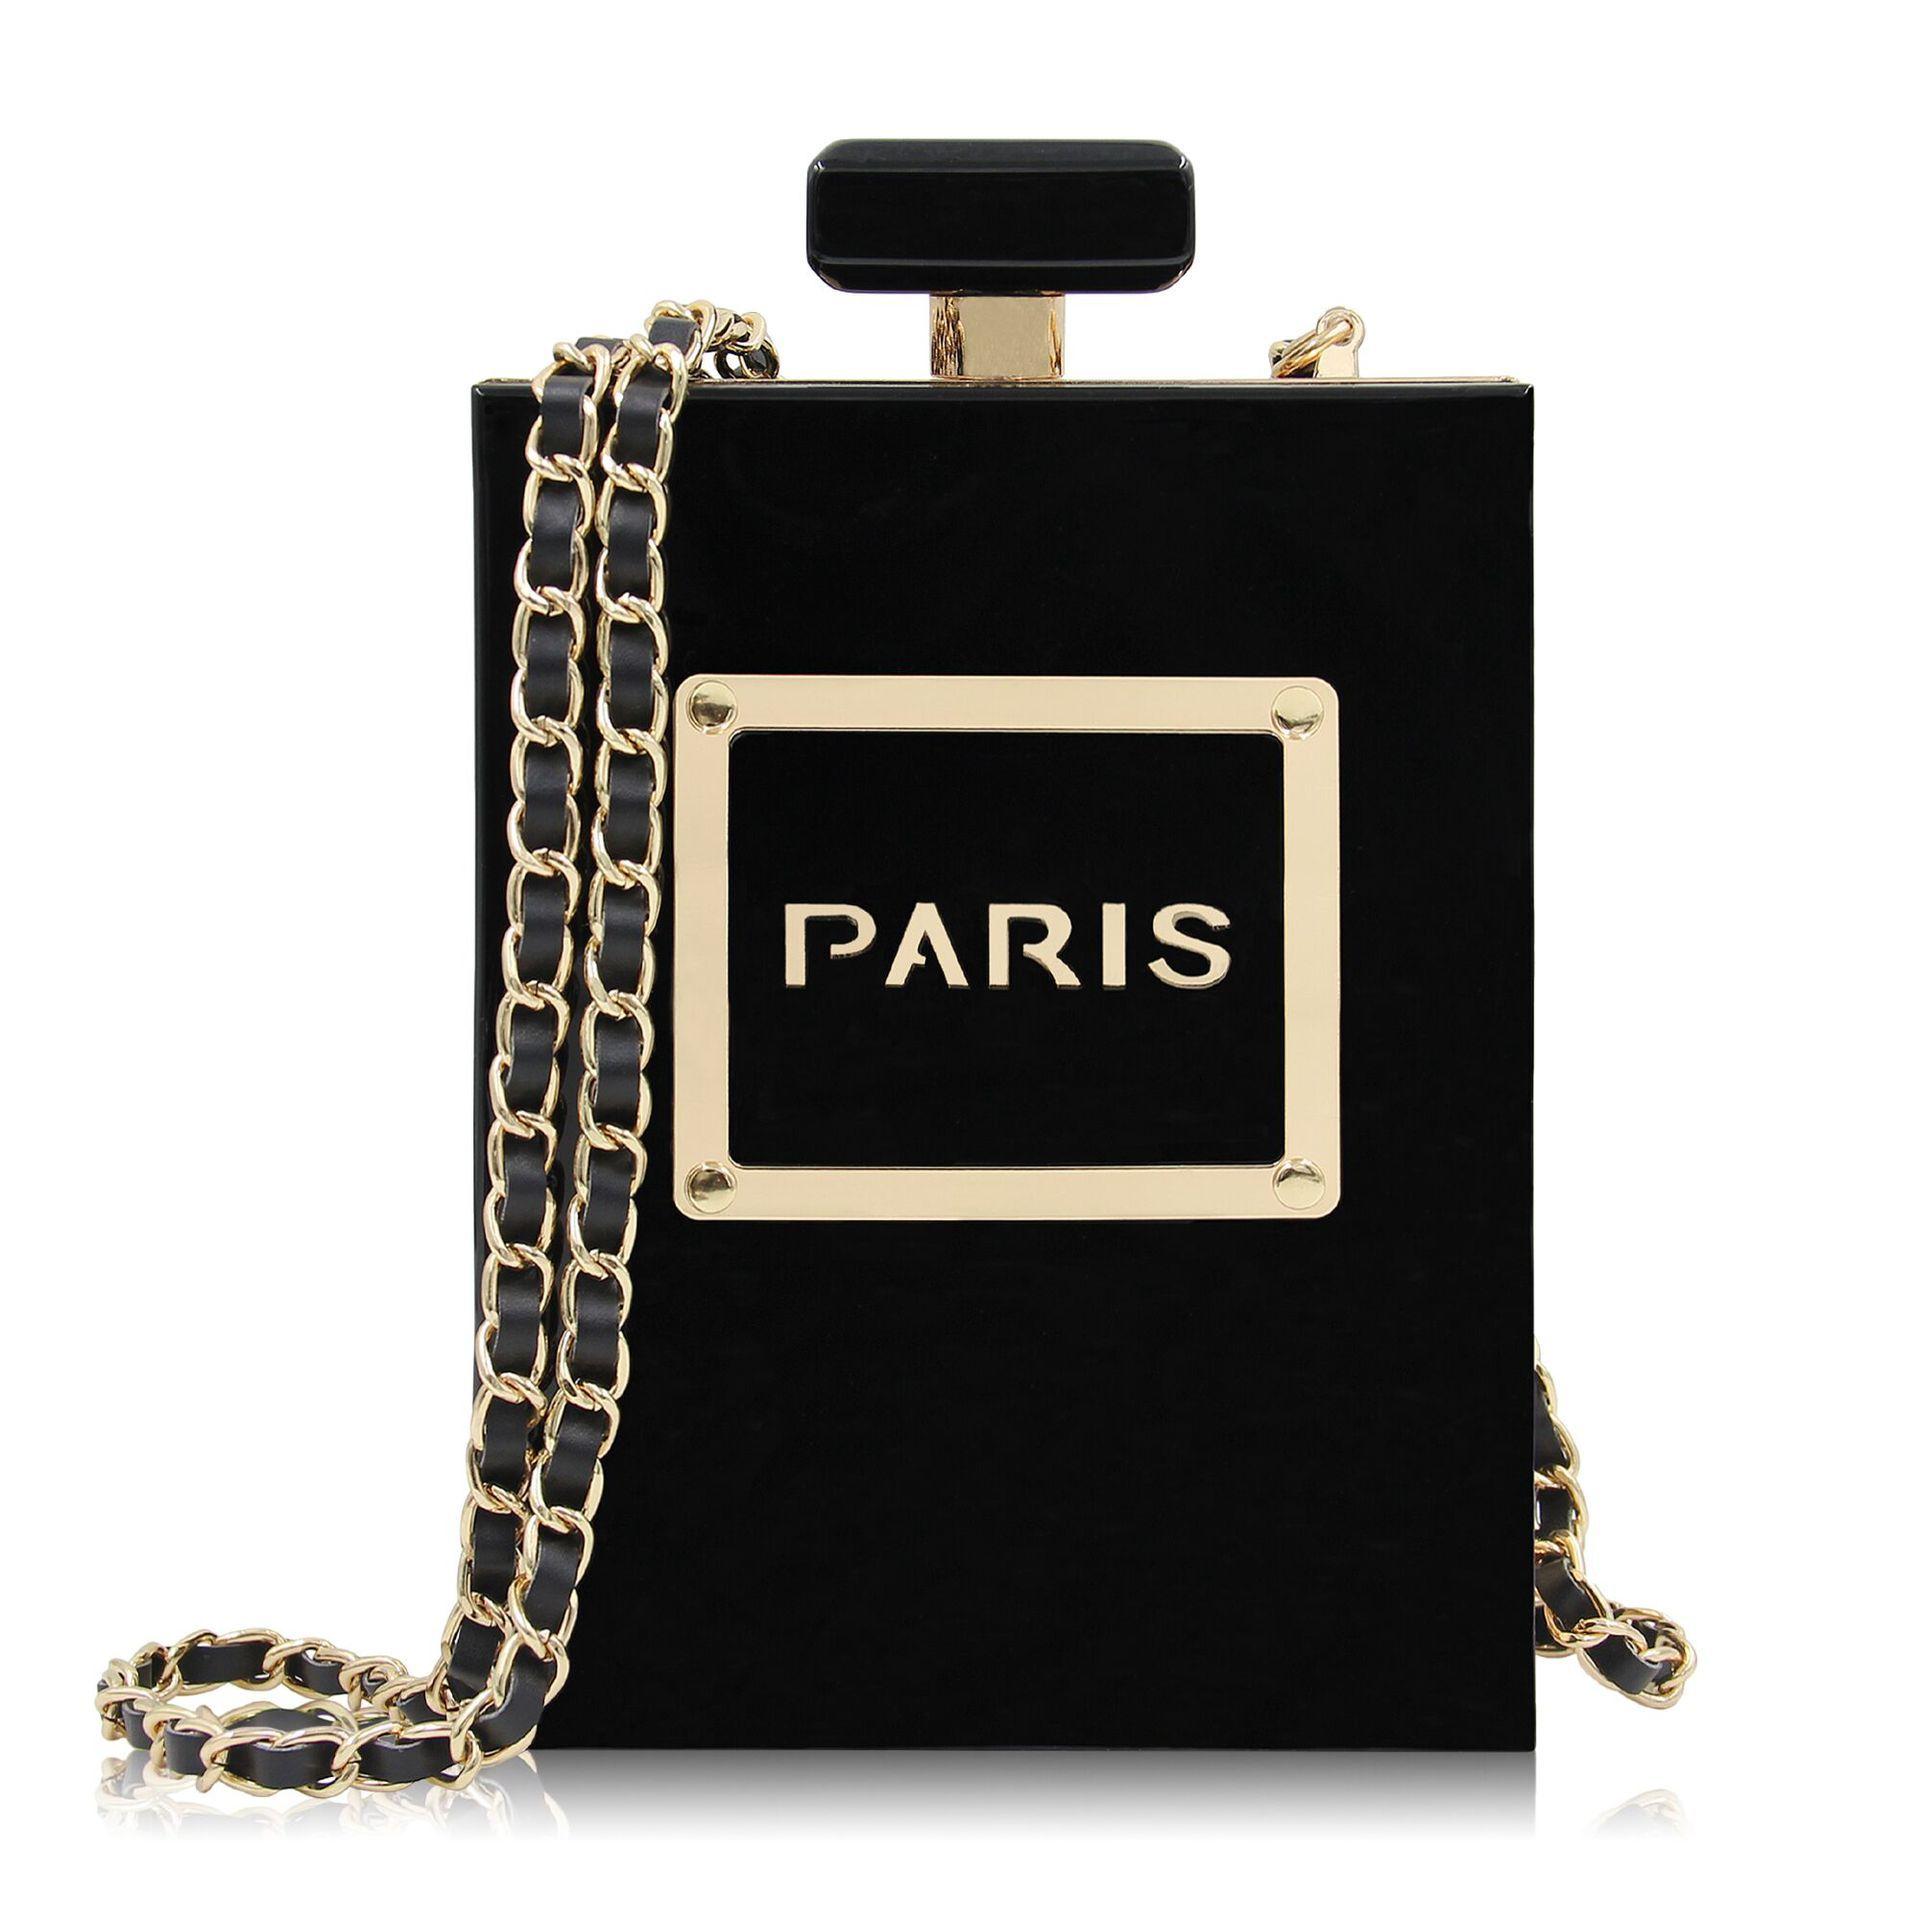 Acrylic Perfume Bottle Transparent Evening Bag Ladies High-end Banquet Clutch Bags